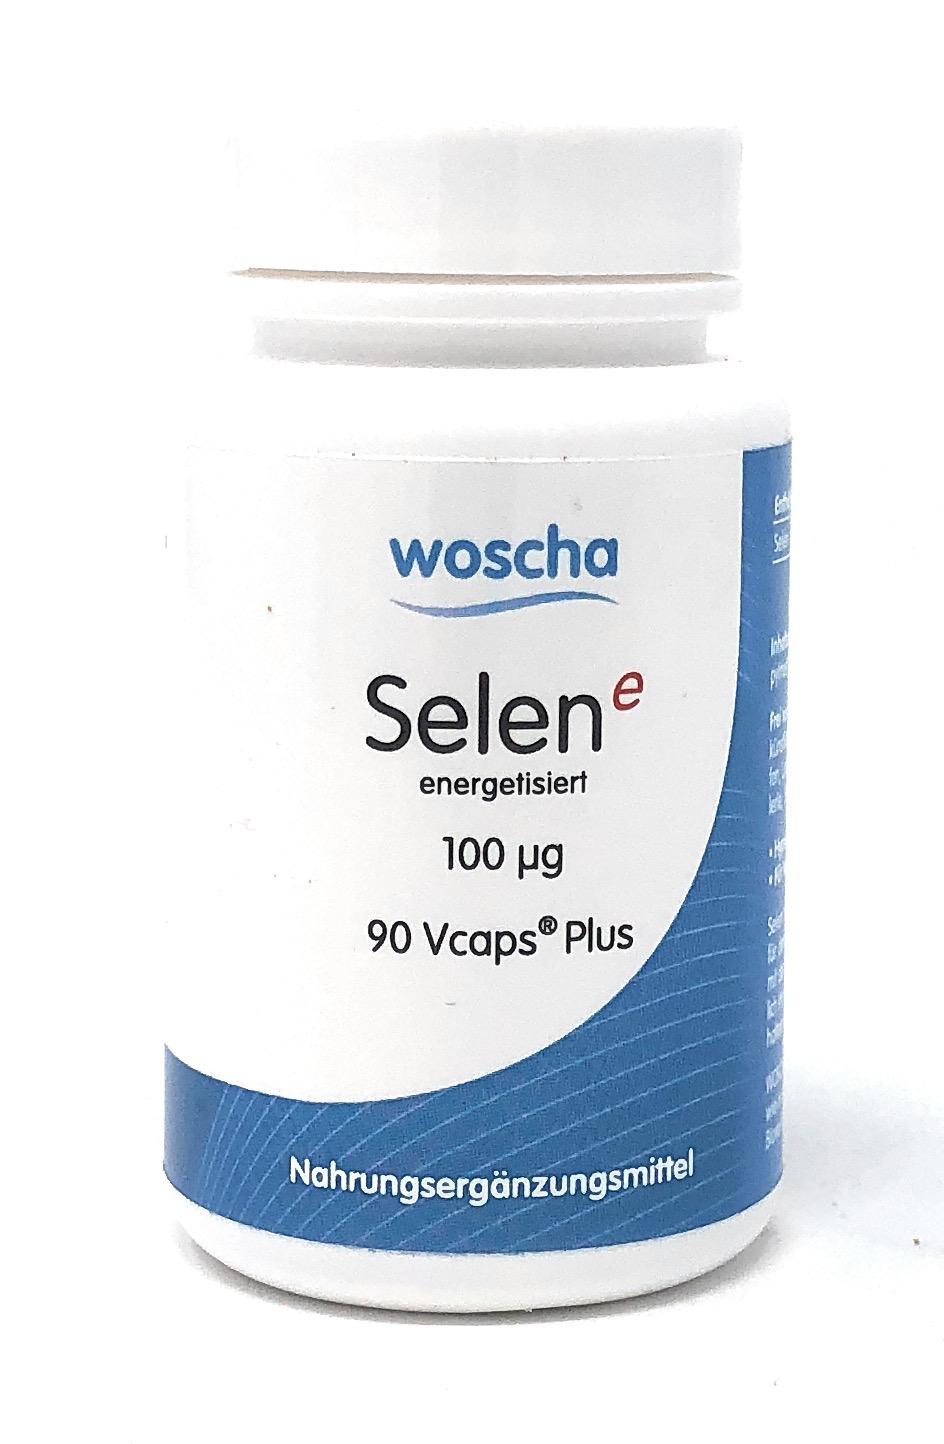 woscha Selen E energetisiert 100mcg (Natriumselenit) 90 Vcaps®Plus (35g) (vegan)